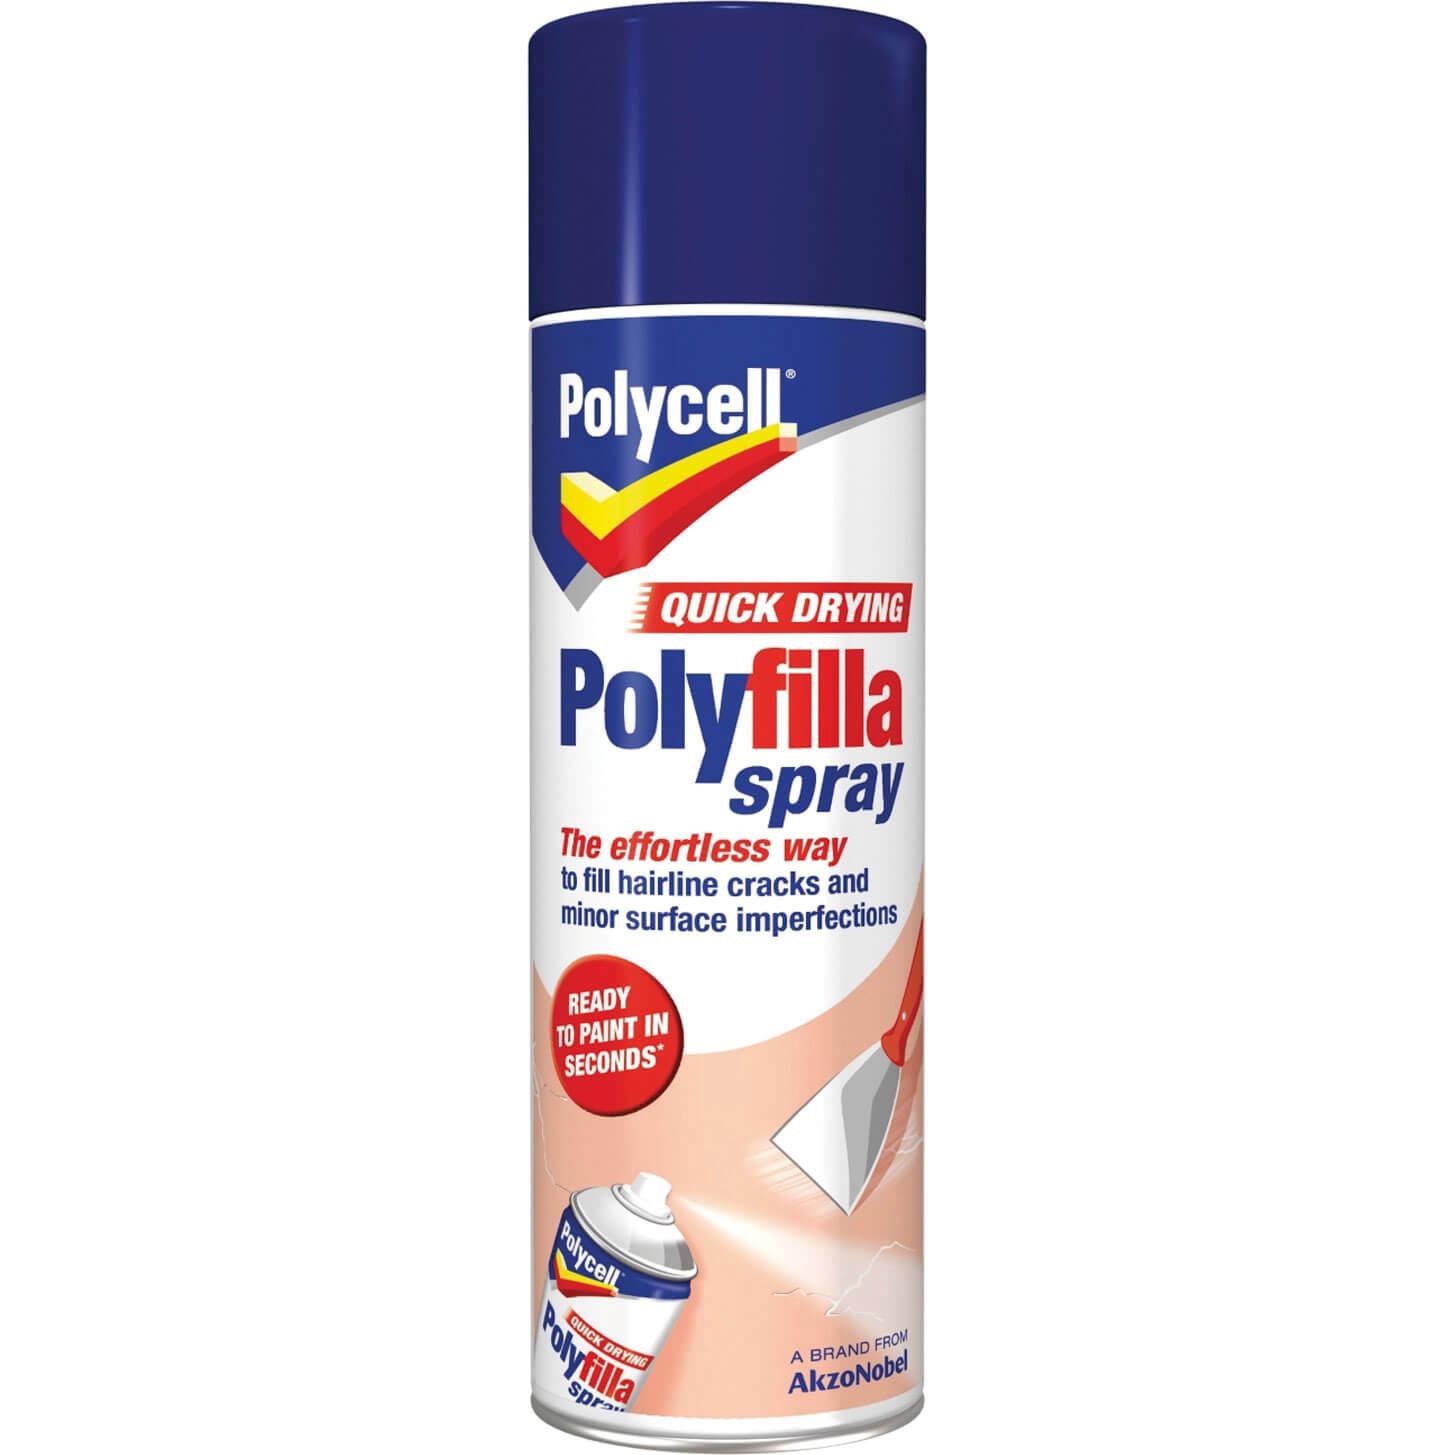 Polycell Quick Drying Polyfilla Spray 300ml